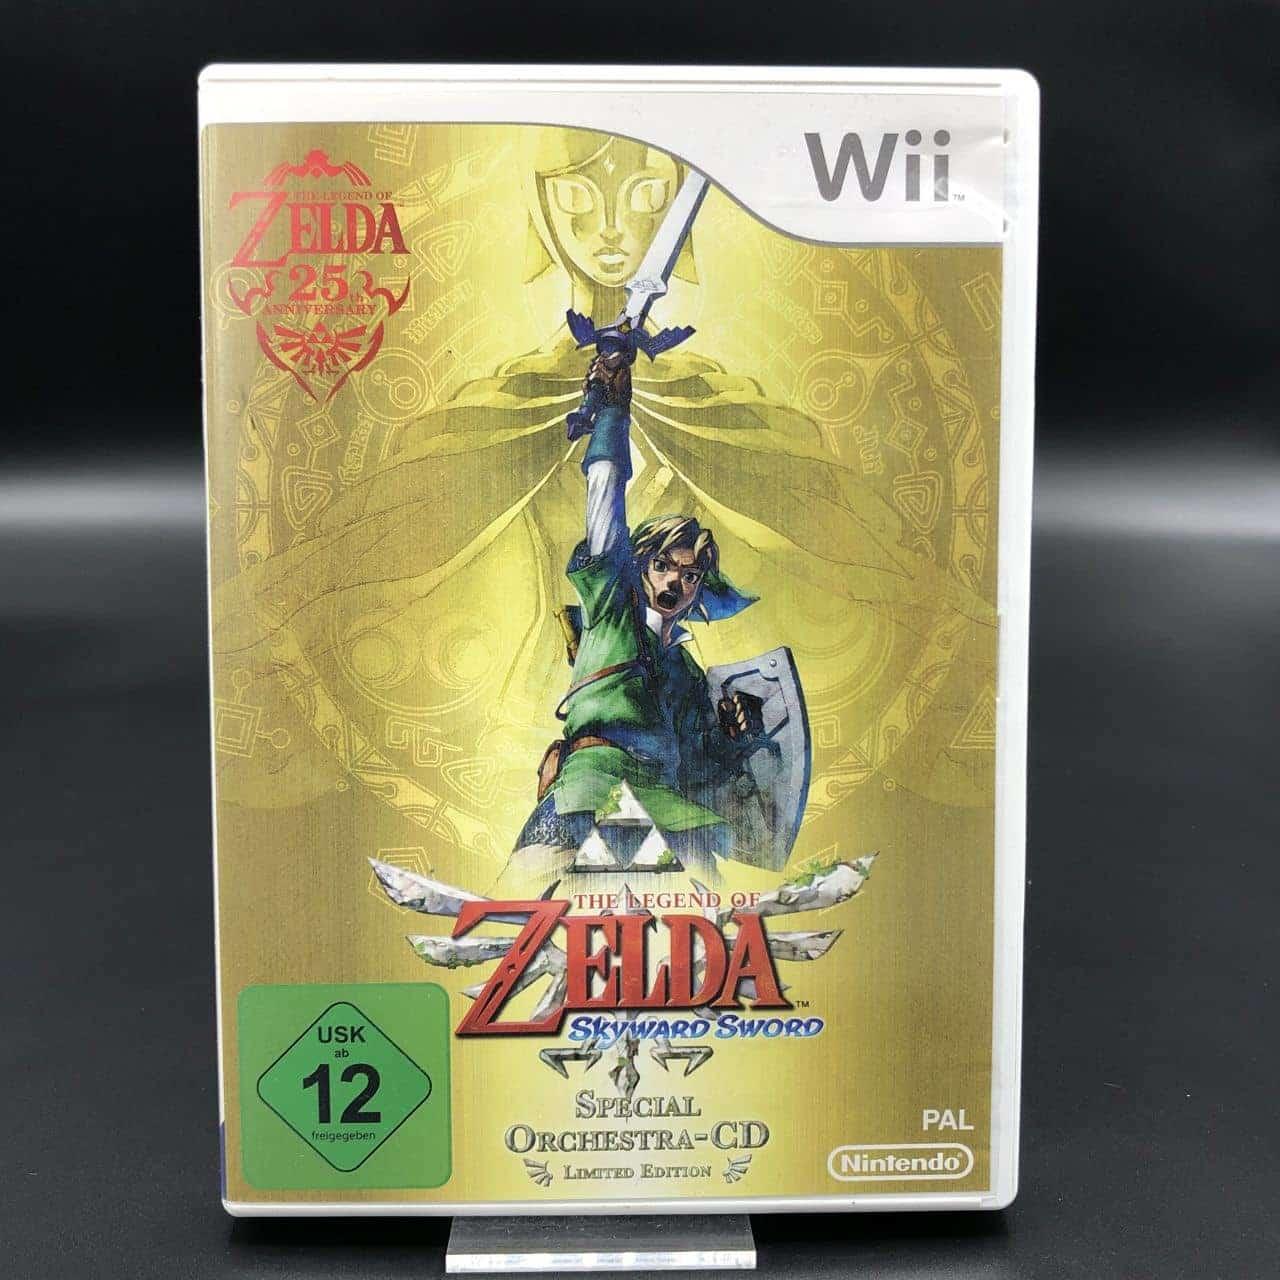 The Legend of Zelda: Skyward Sword + Special Orchestra CD (Limited Edition) (Komplett) (Sehr gut) Nintendo Wii